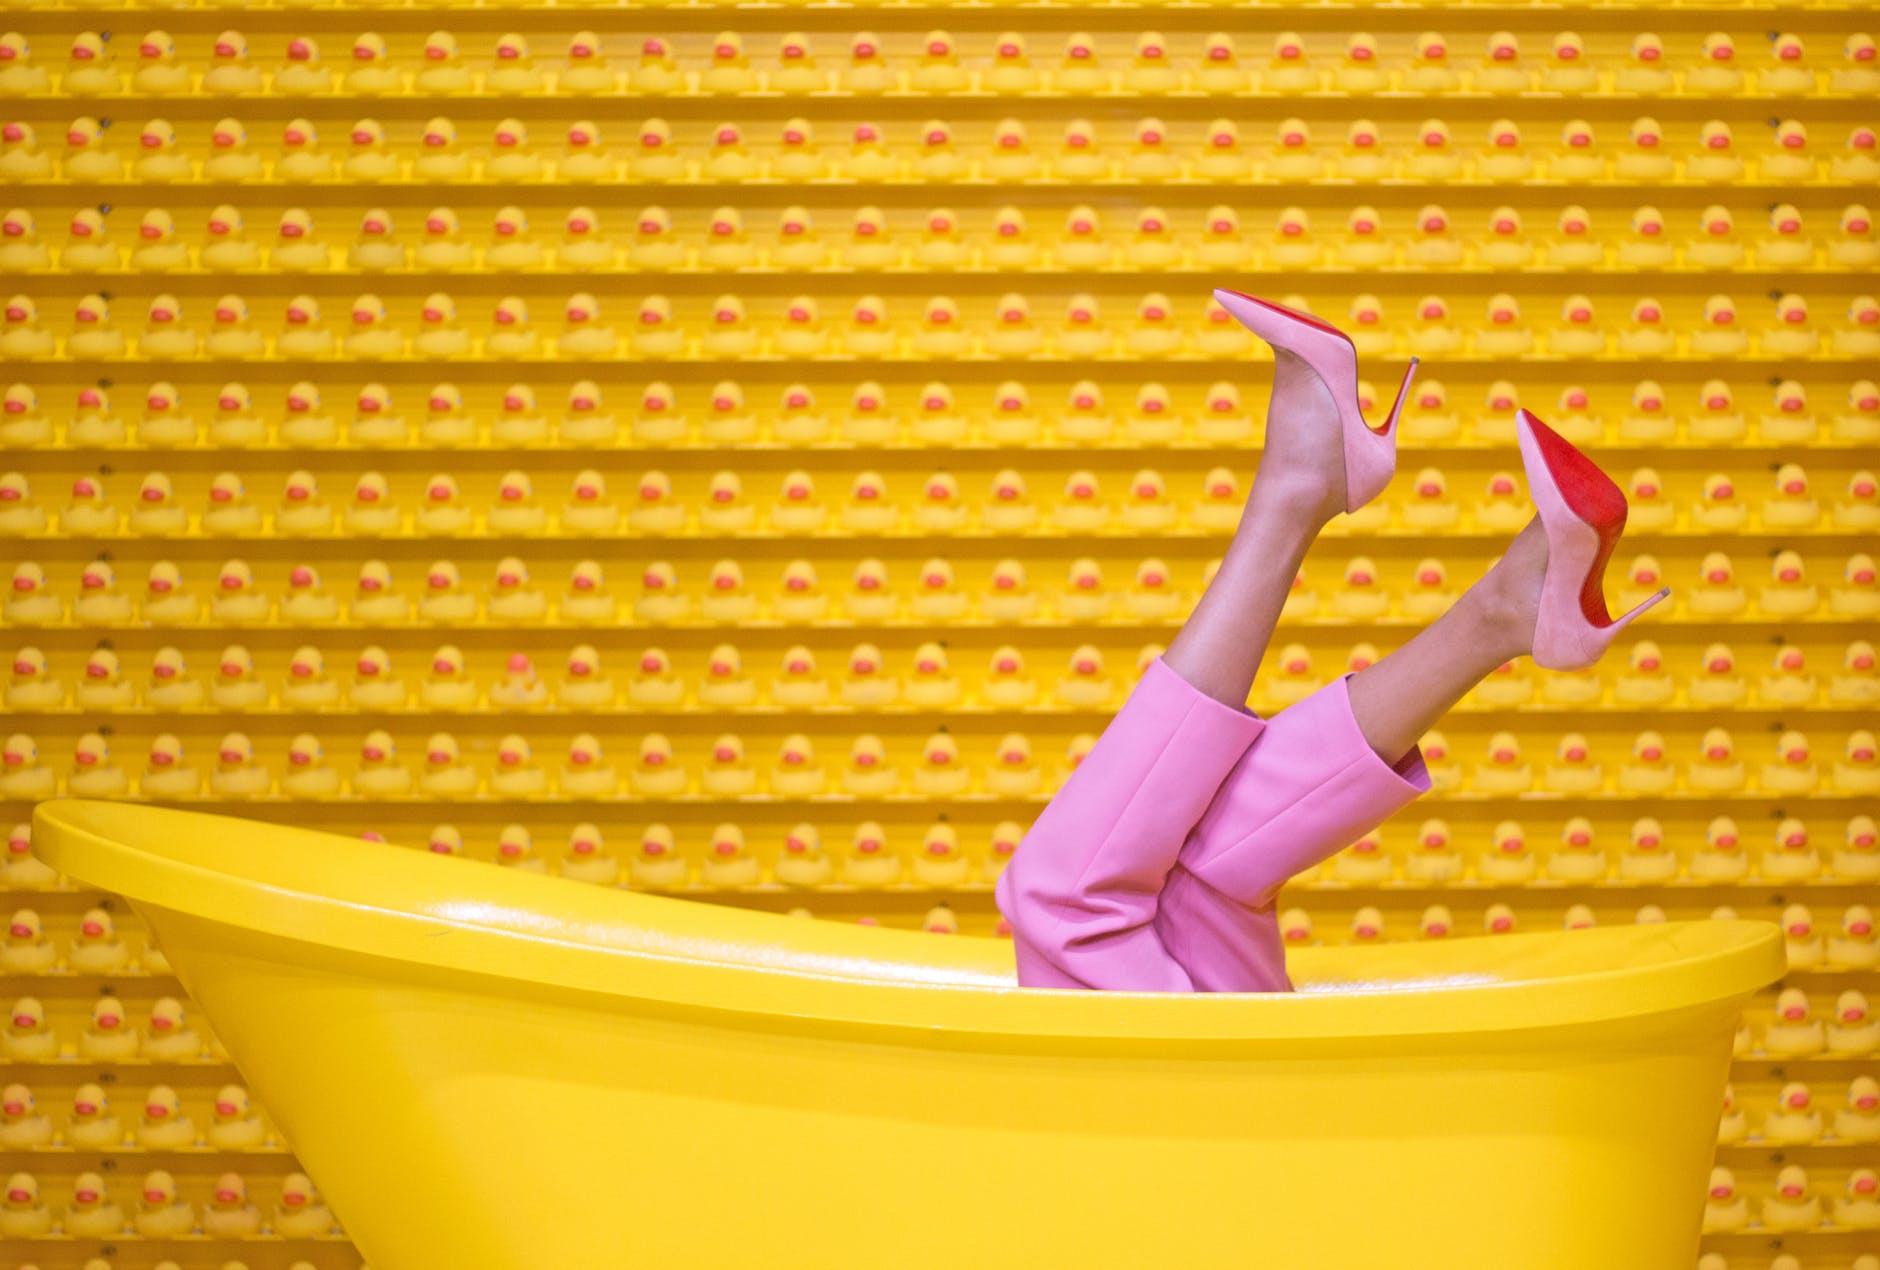 yellow steel bathtub